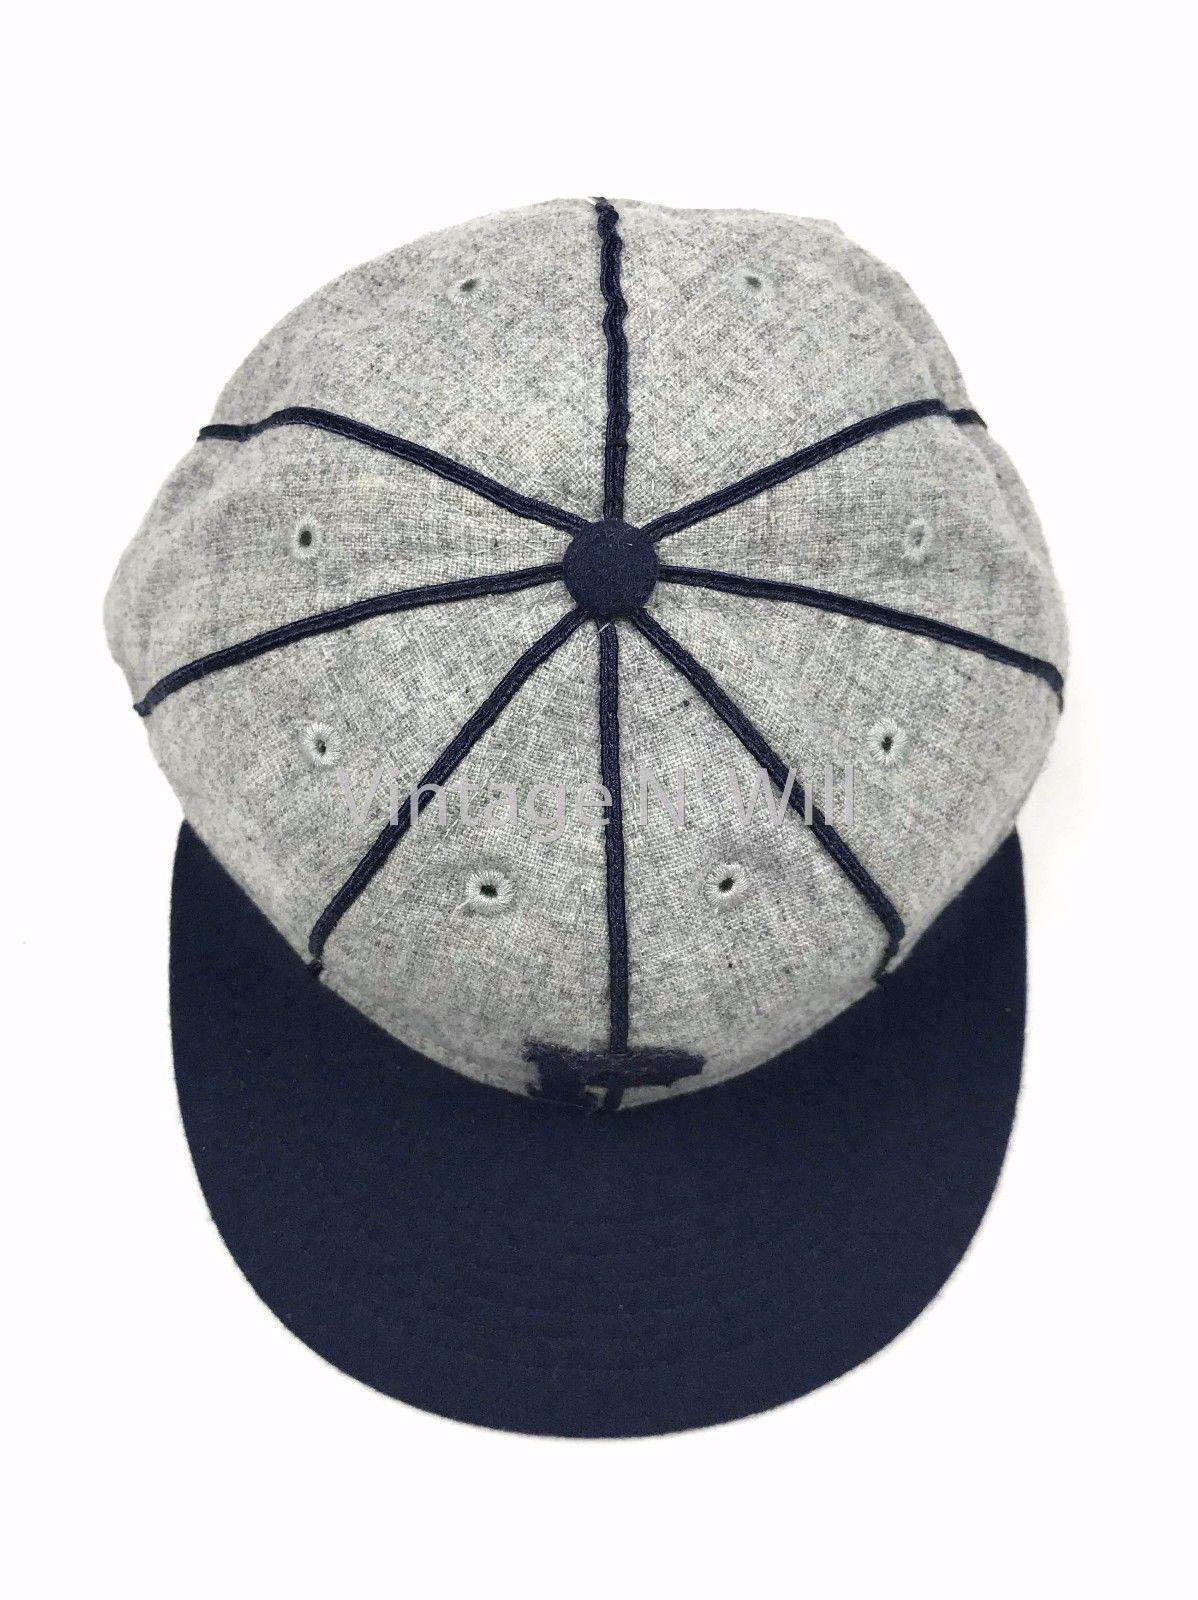 c48f1155e2264 Ebbets Field Flannel Portland Beavers Blue  Gray Retro Wool Baseball Hat  Cap USA